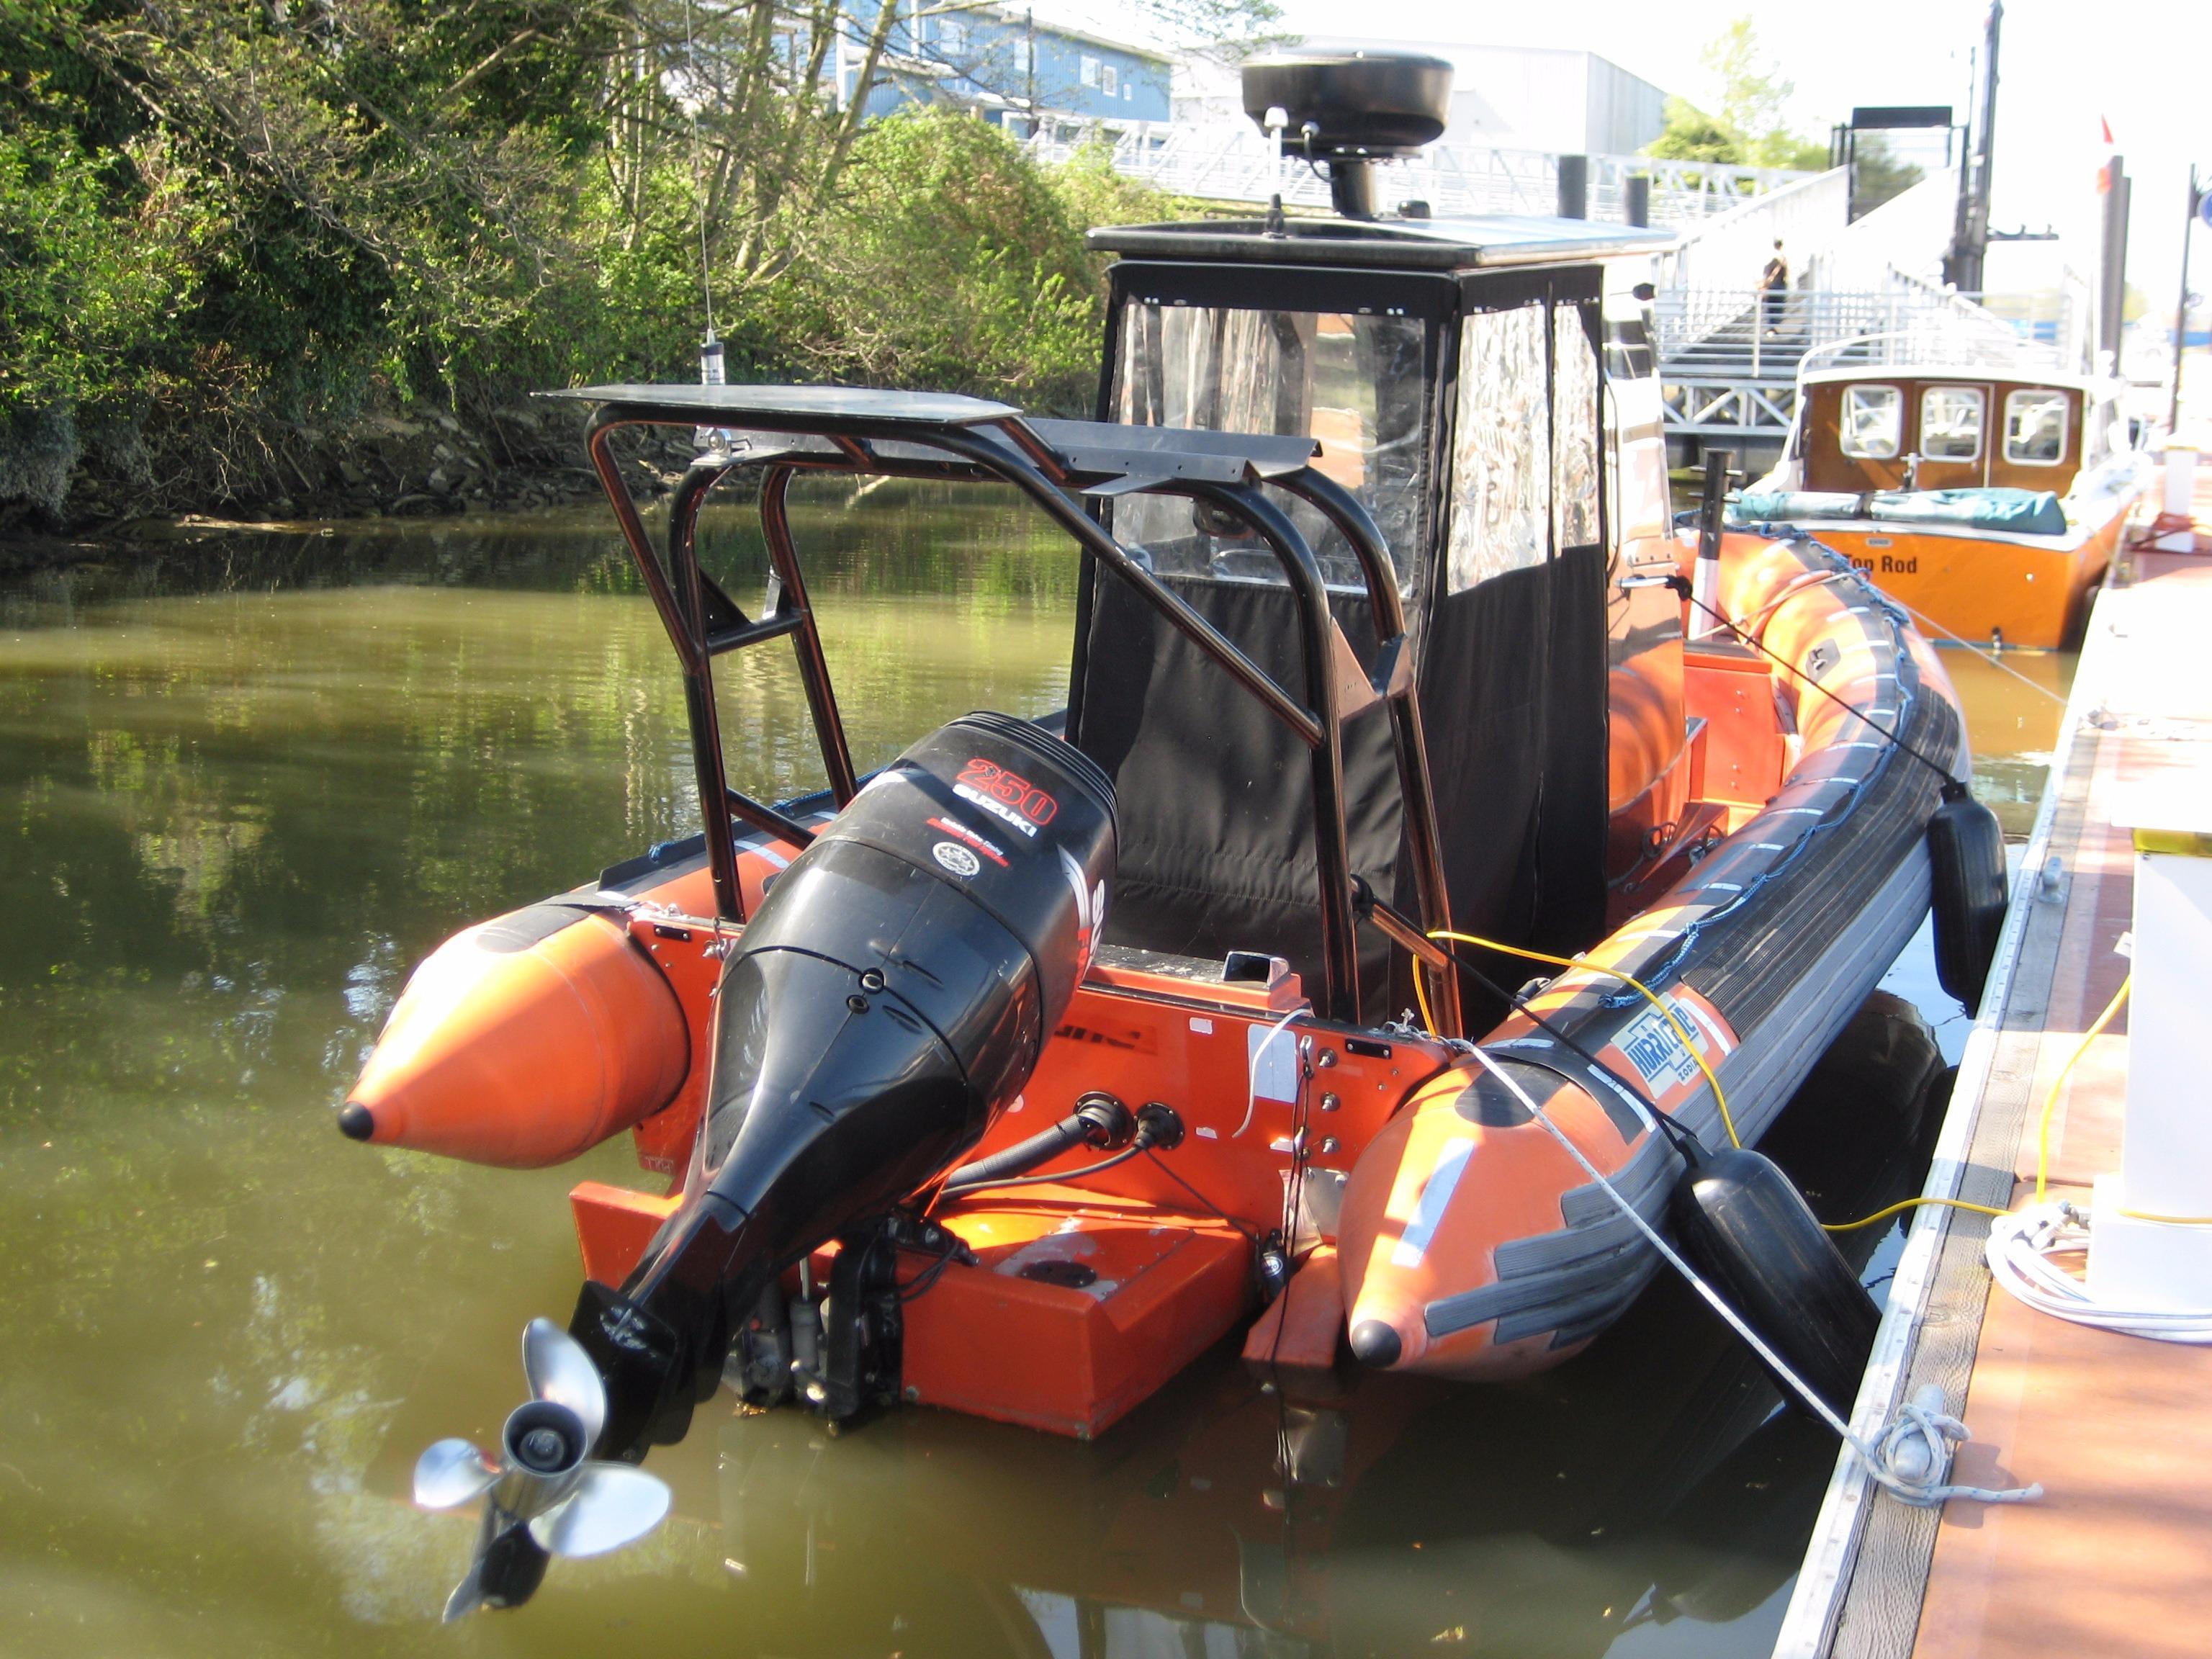 1998 ZODIAC HURRICANE 733 Power Boat For Sale Www